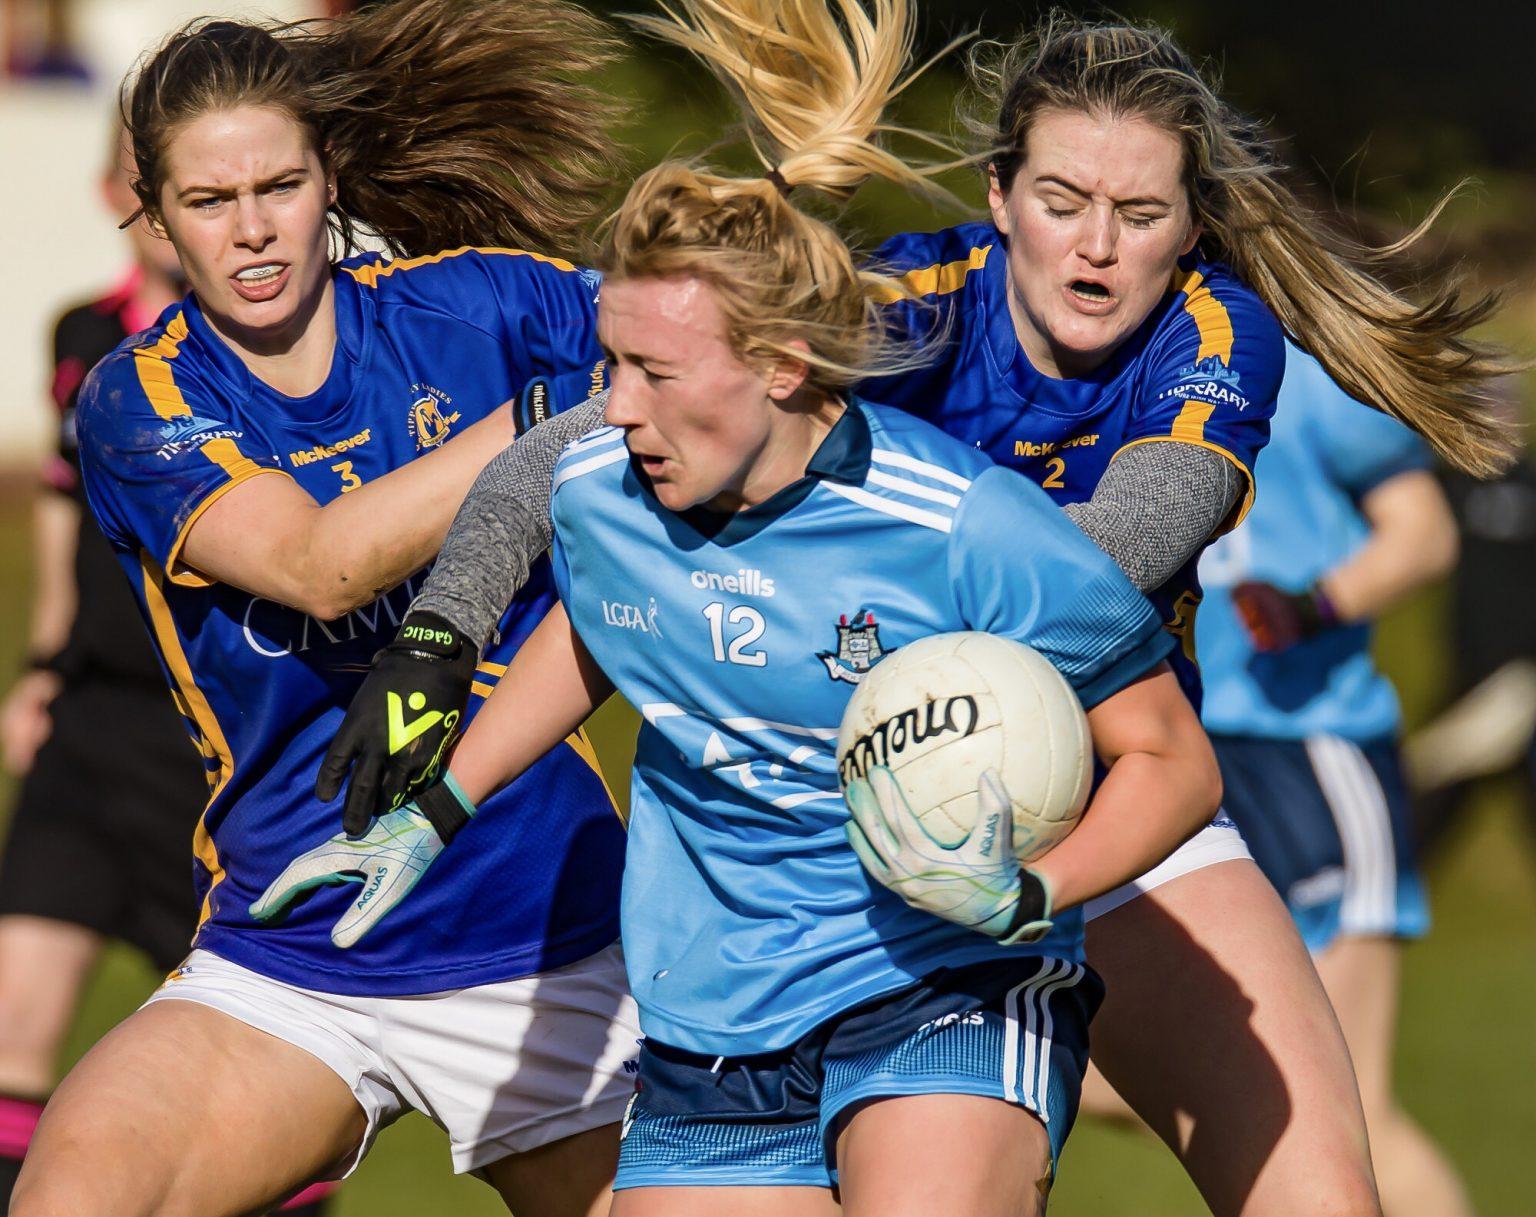 Carla Rowe Dublin in a sky blue jersey evades two Tipperary players in dark blue jerseys